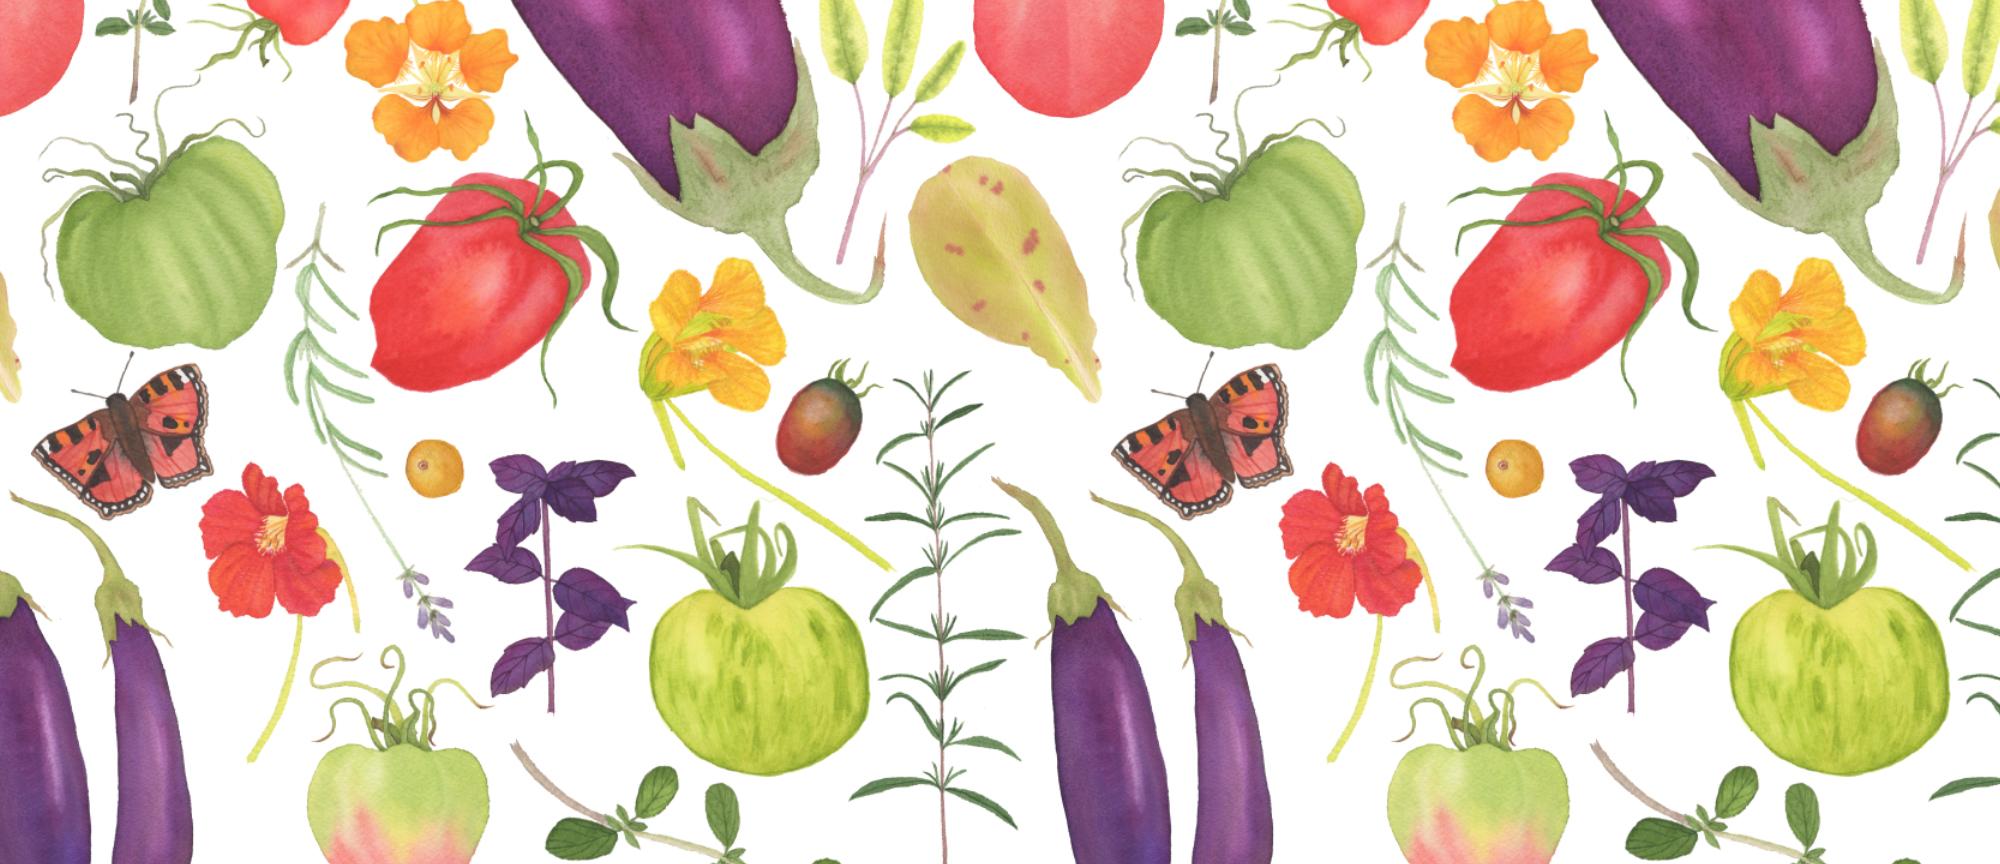 Watercolor Kitchen Garden Fabric Design by Anne Butera